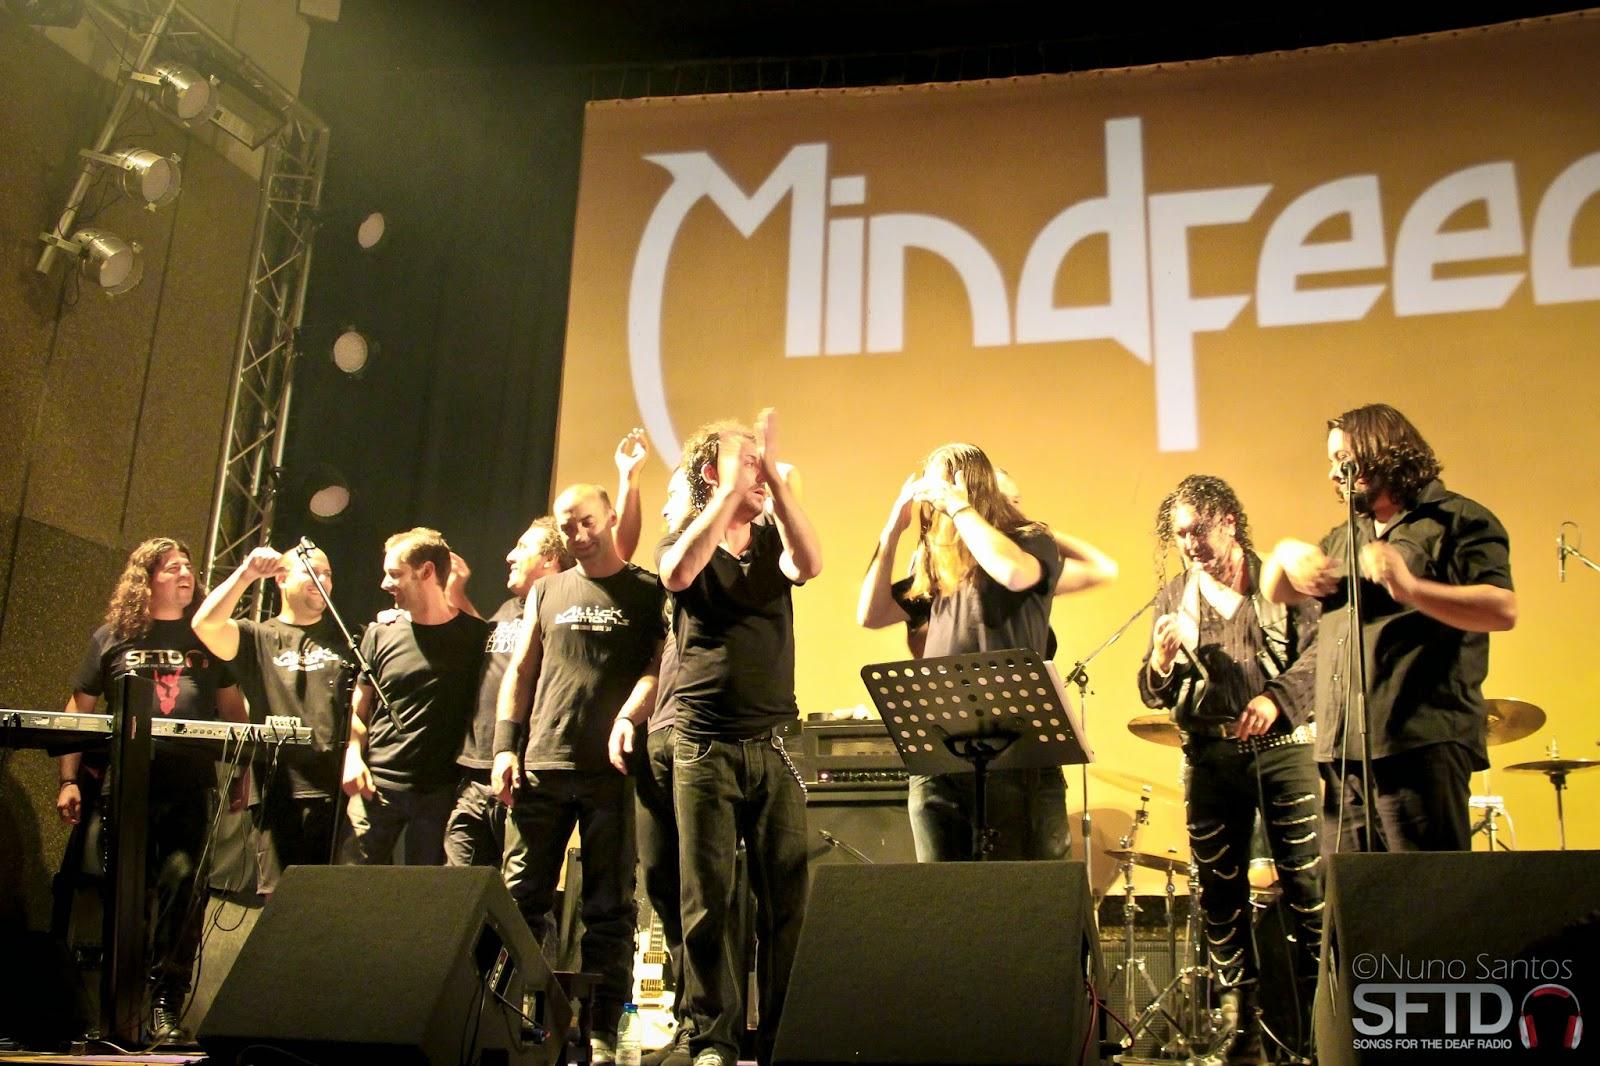 2014.09.26-Festa de Aniversário Mindfeeder- Attick Demons - Cine Incrível Almadense IMG_8474